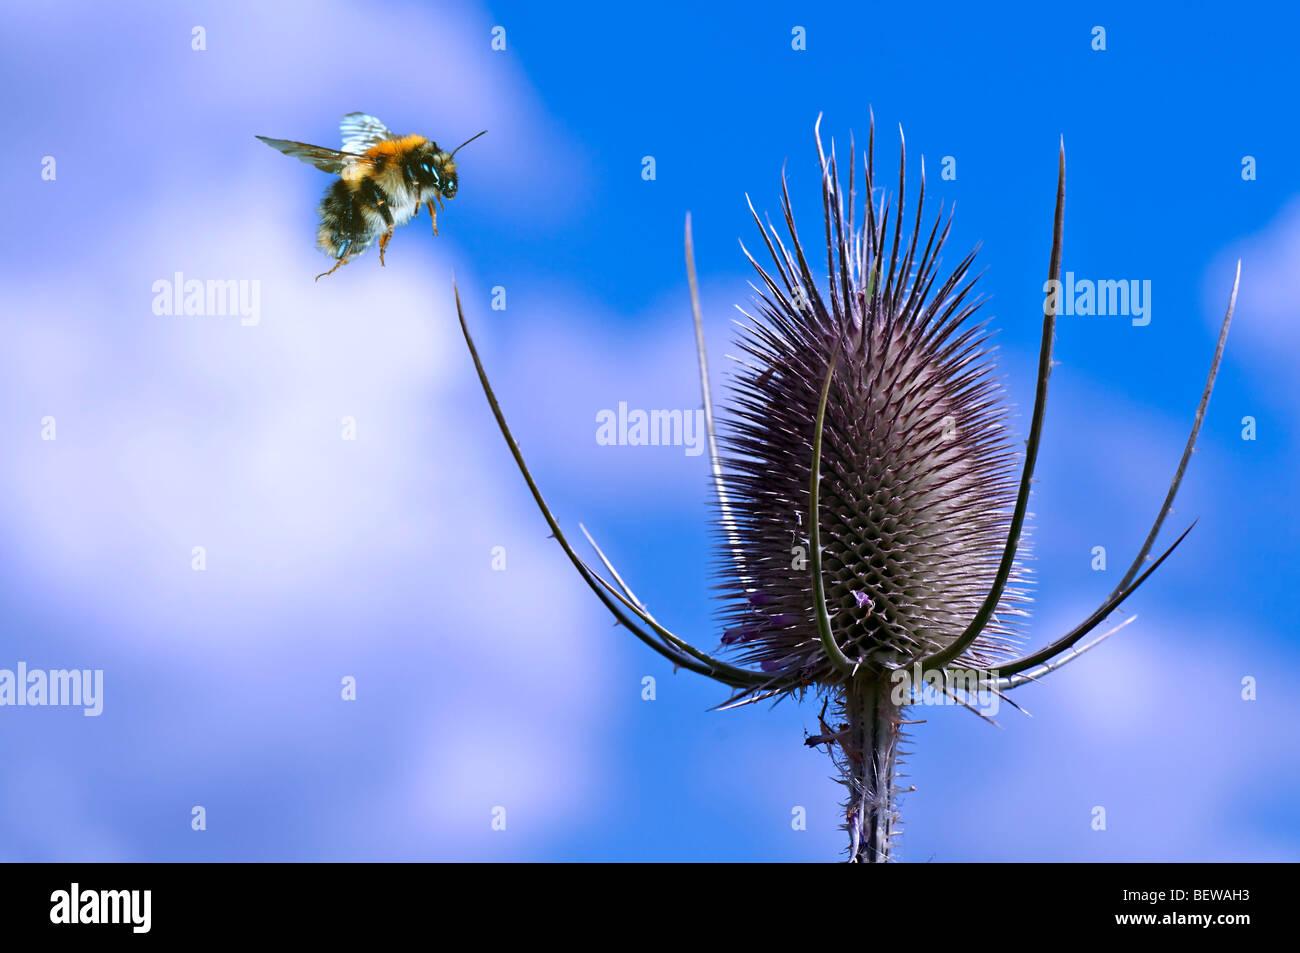 Bombus lucorum flying to Dipsacus fullonum, close-up - Stock Image